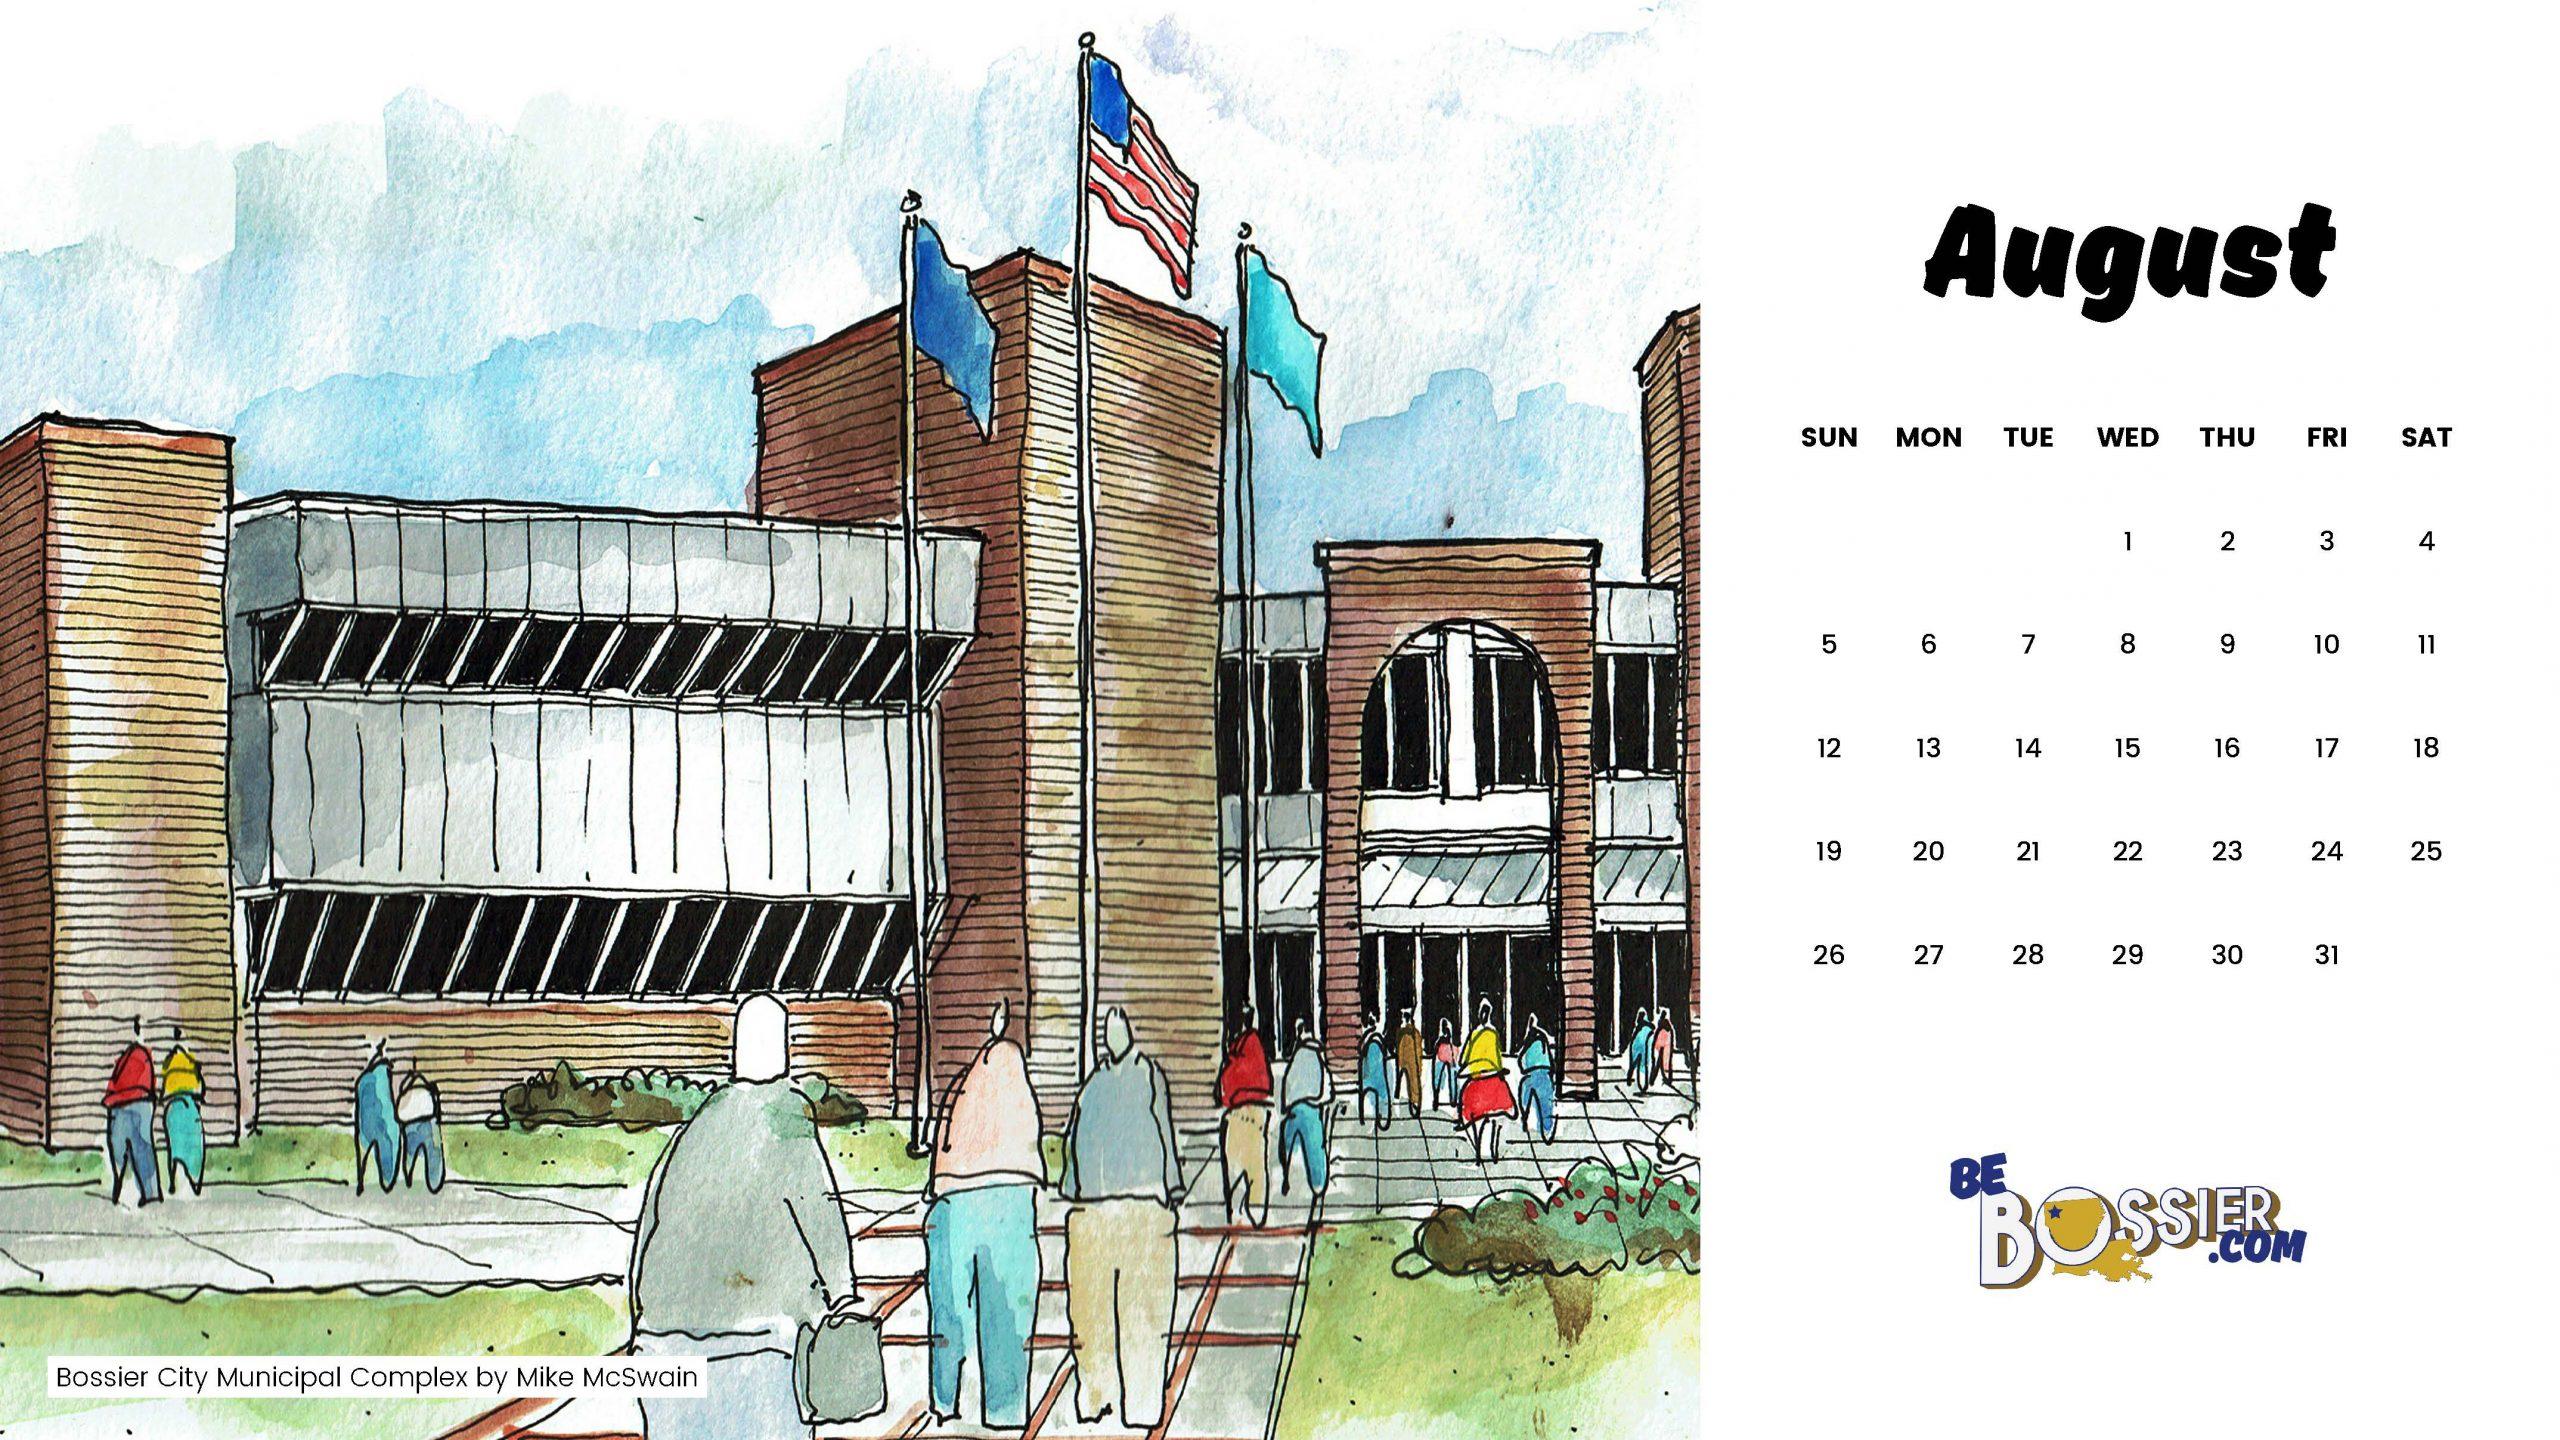 August Arrives With A Bossier Calendar | Be Bossier Intended For Bossier Parish School Board Calendar